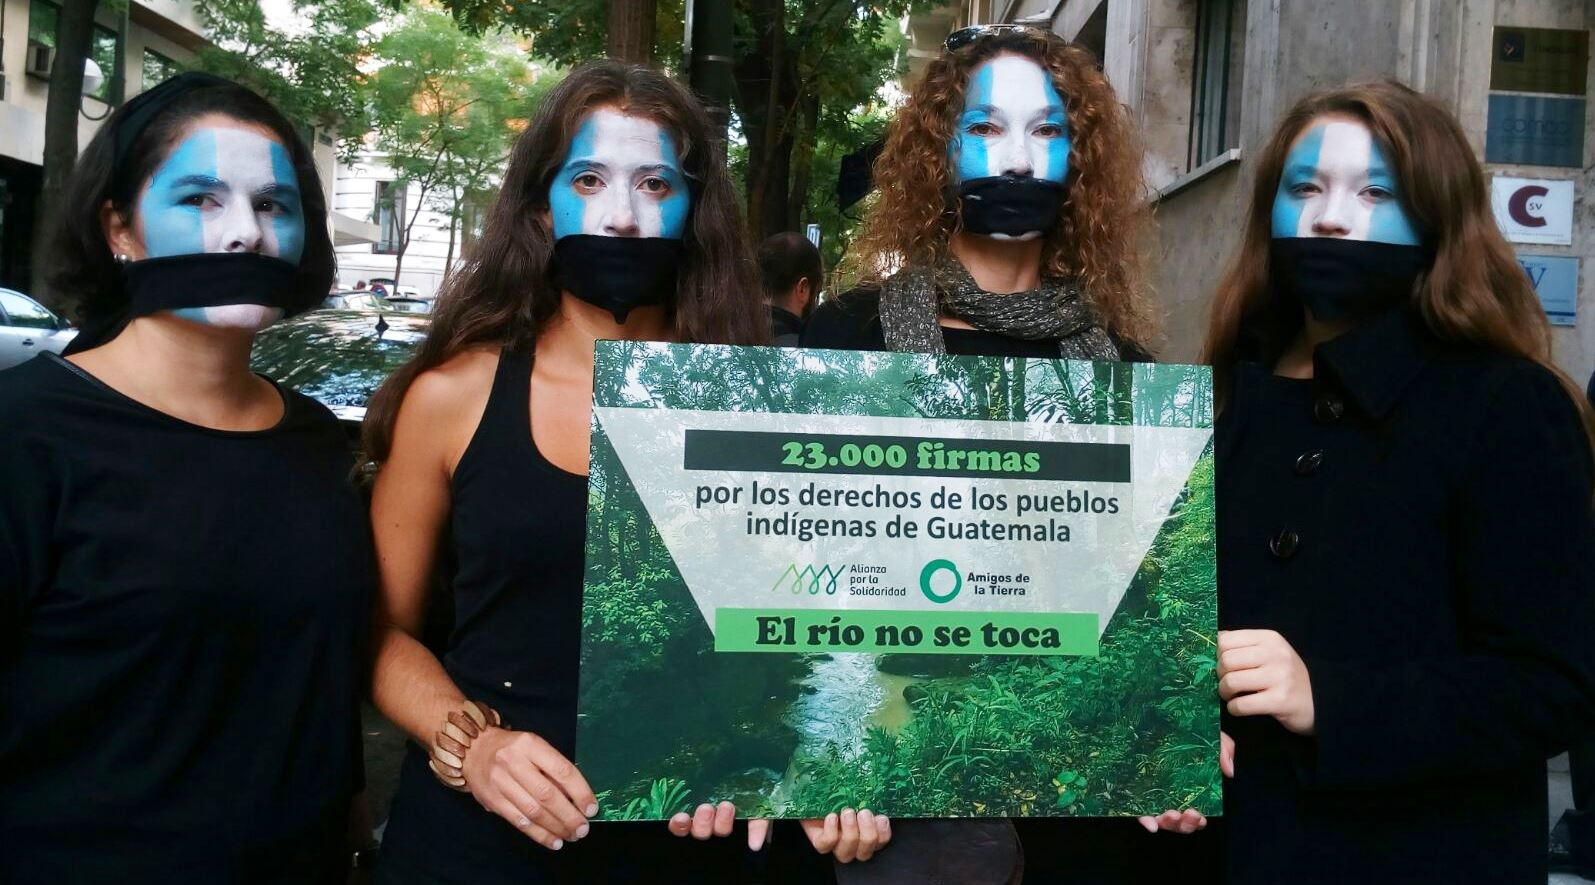 Ir a Entrega de firmas en la Embajada de Guatemala